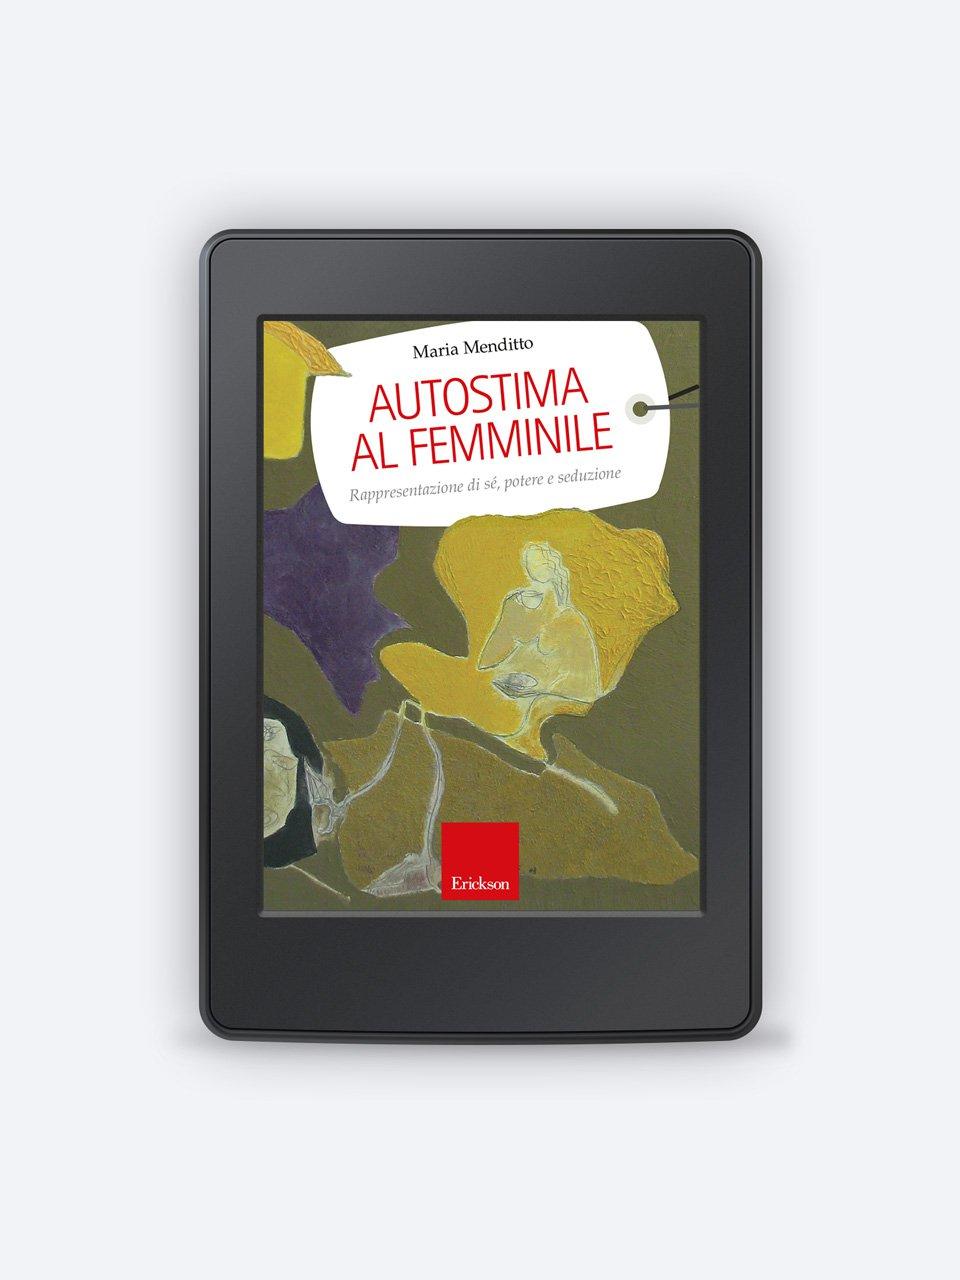 Autostima al femminile - Processi Affettivo-Relazionali Legati a Sé - Erickson